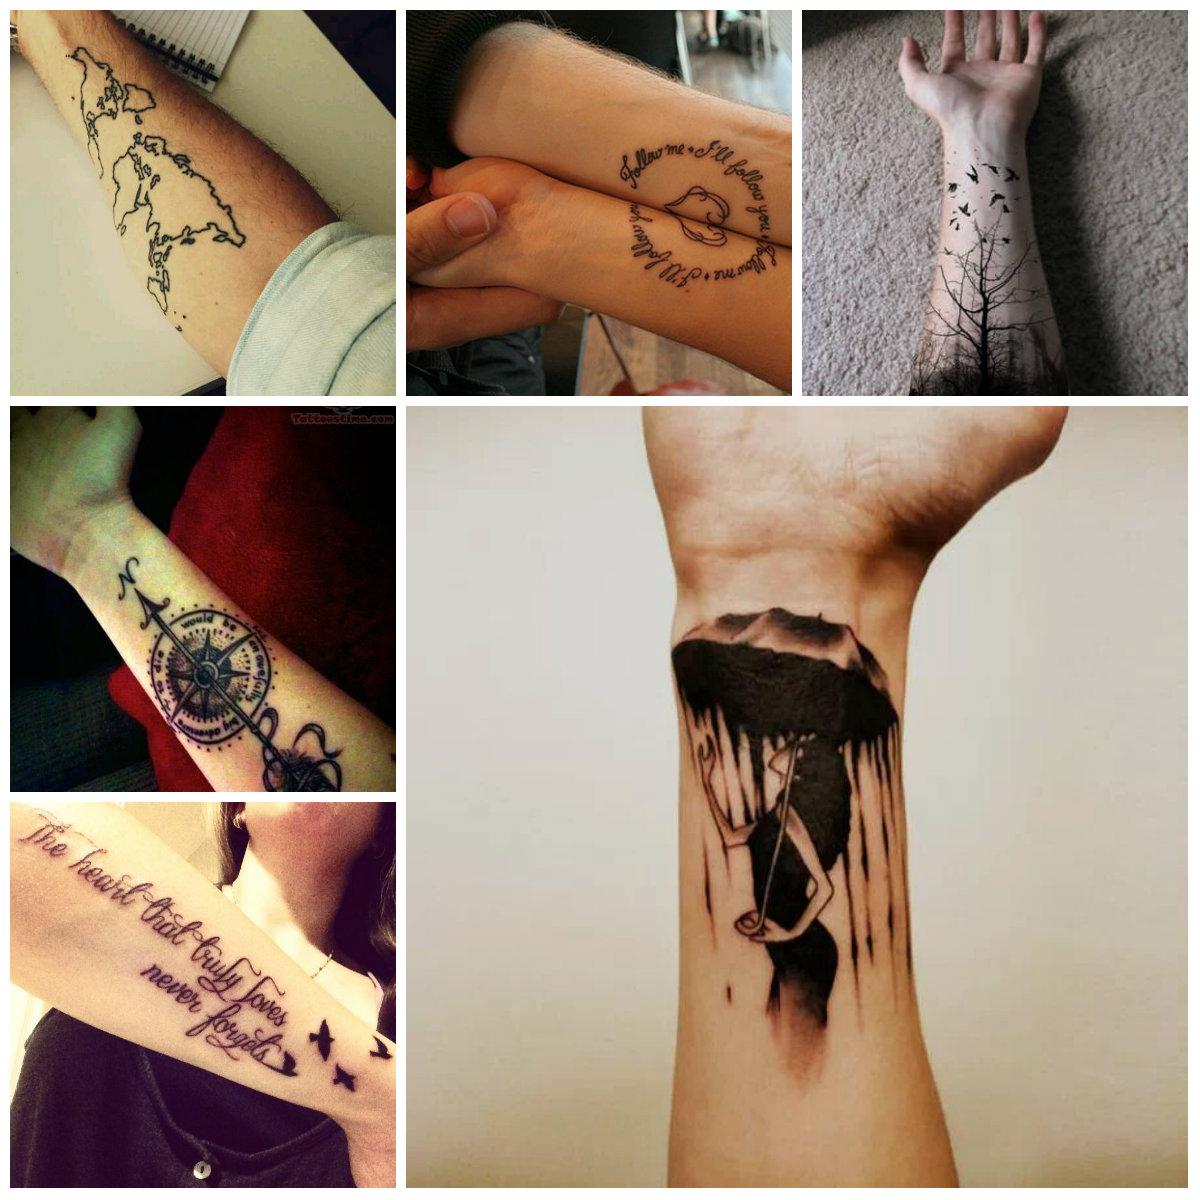 tattoo designs for men 2016 11 forearm tattoos 2016 jpg\